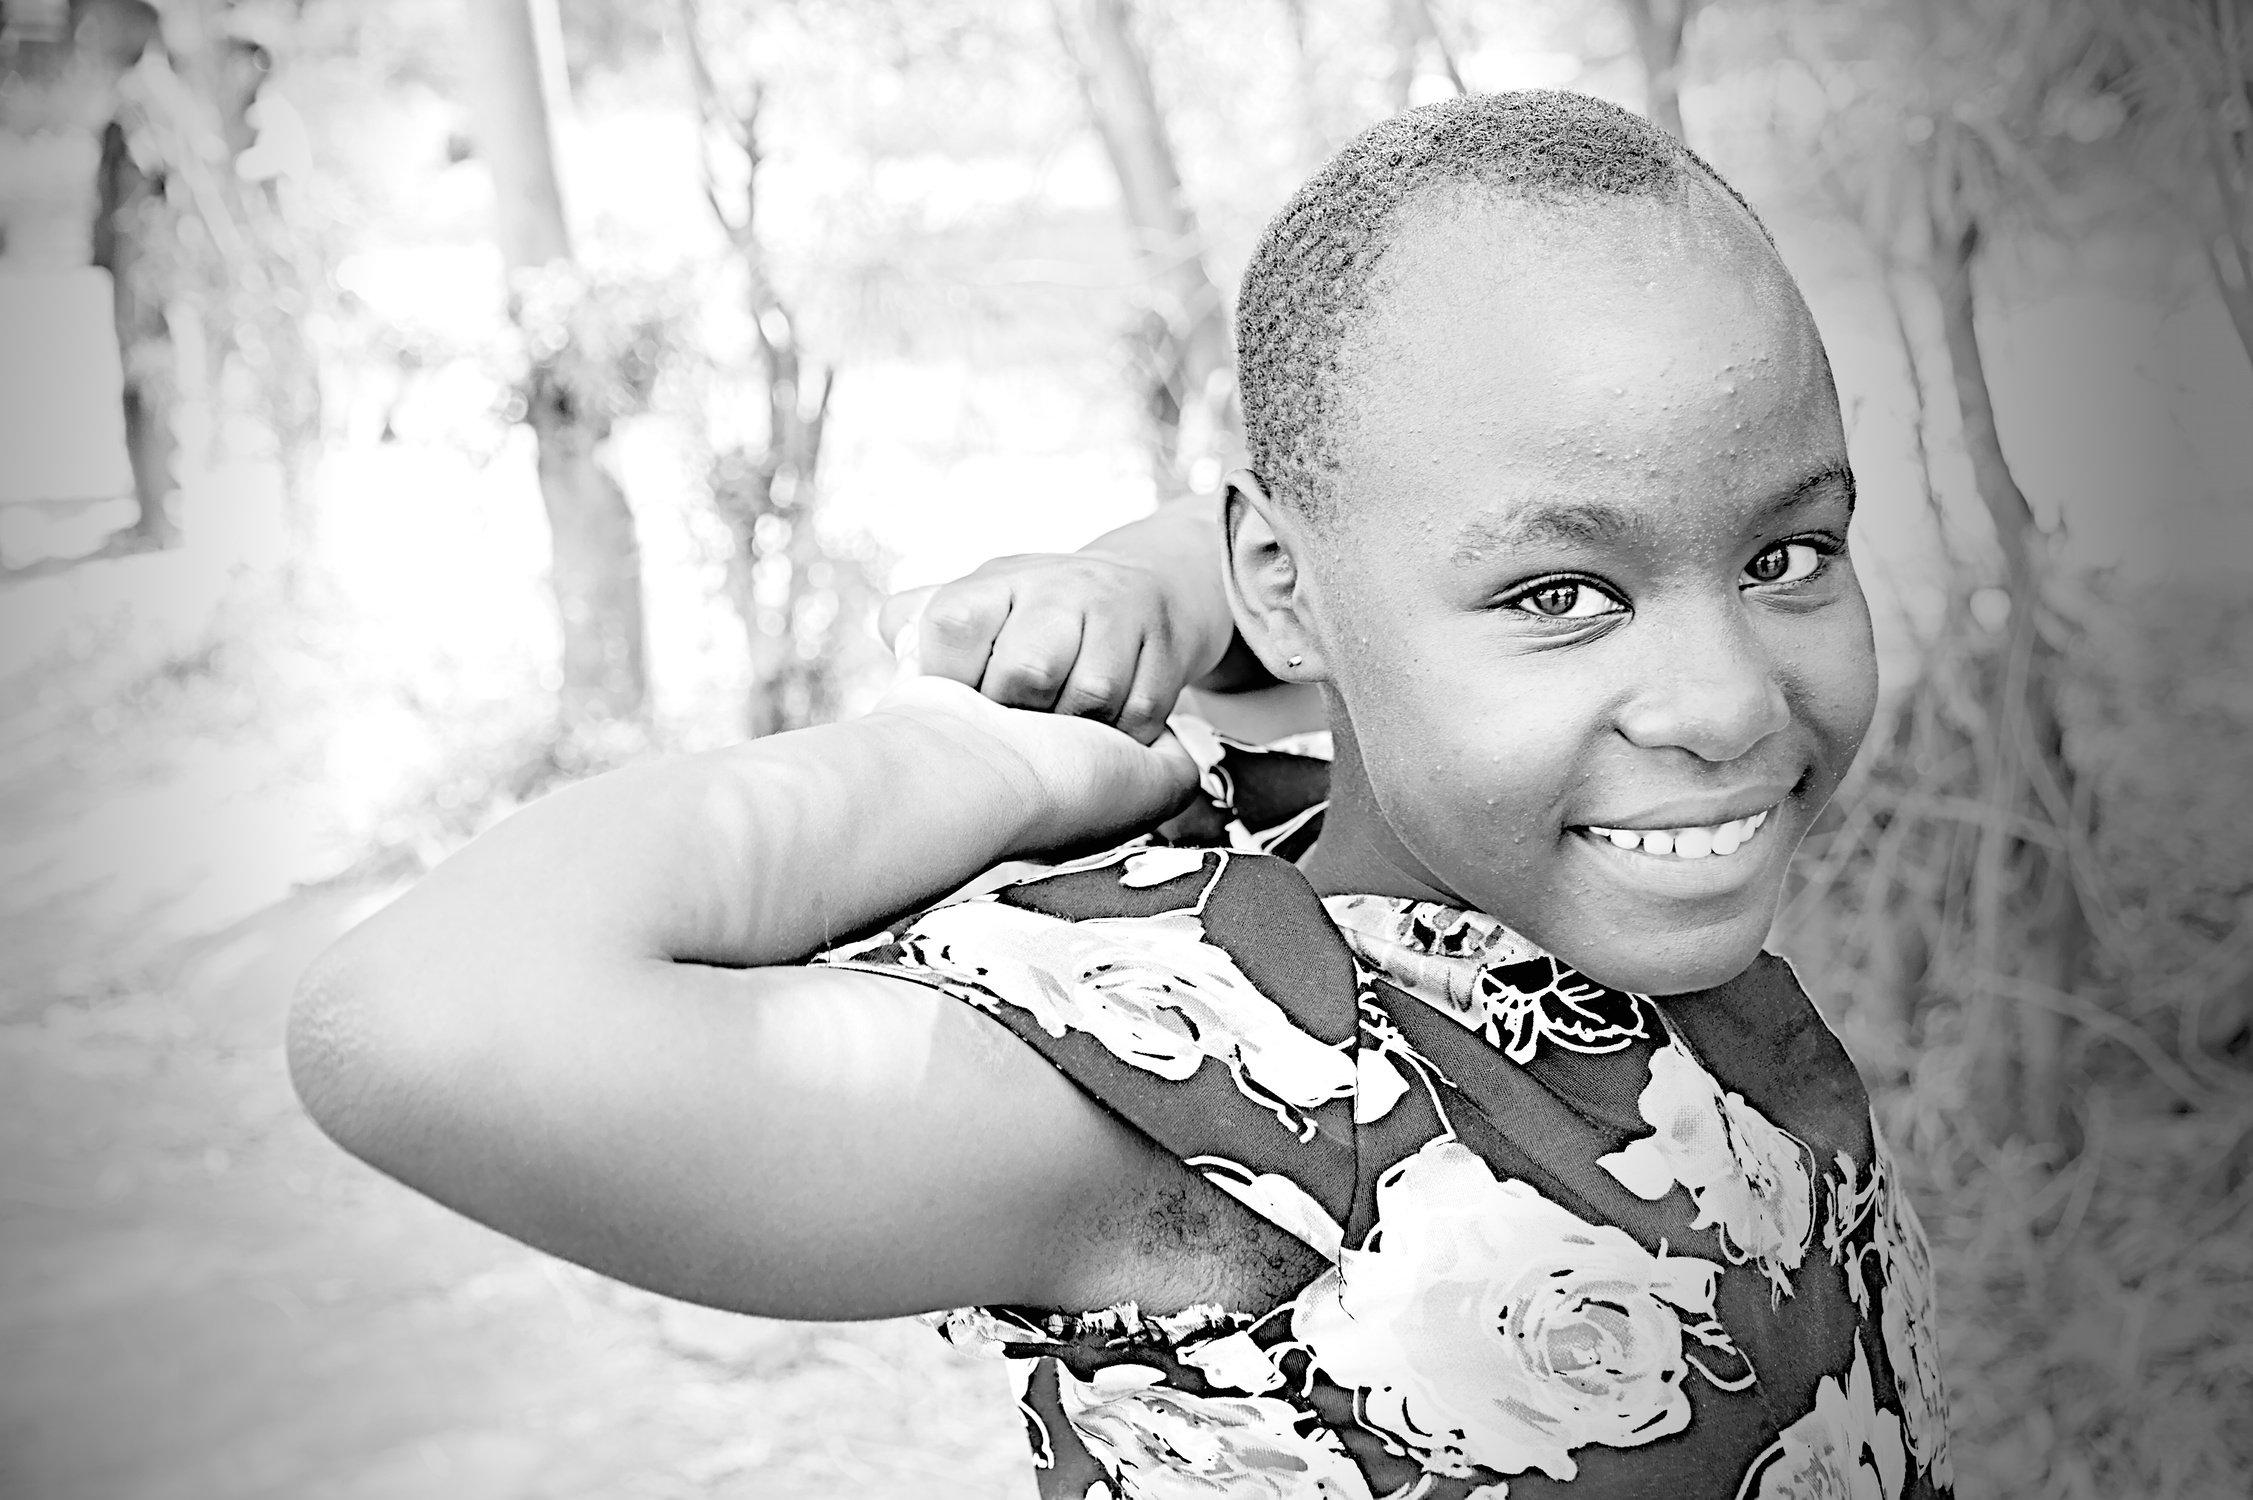 dtstyle net - a darktable styles repository